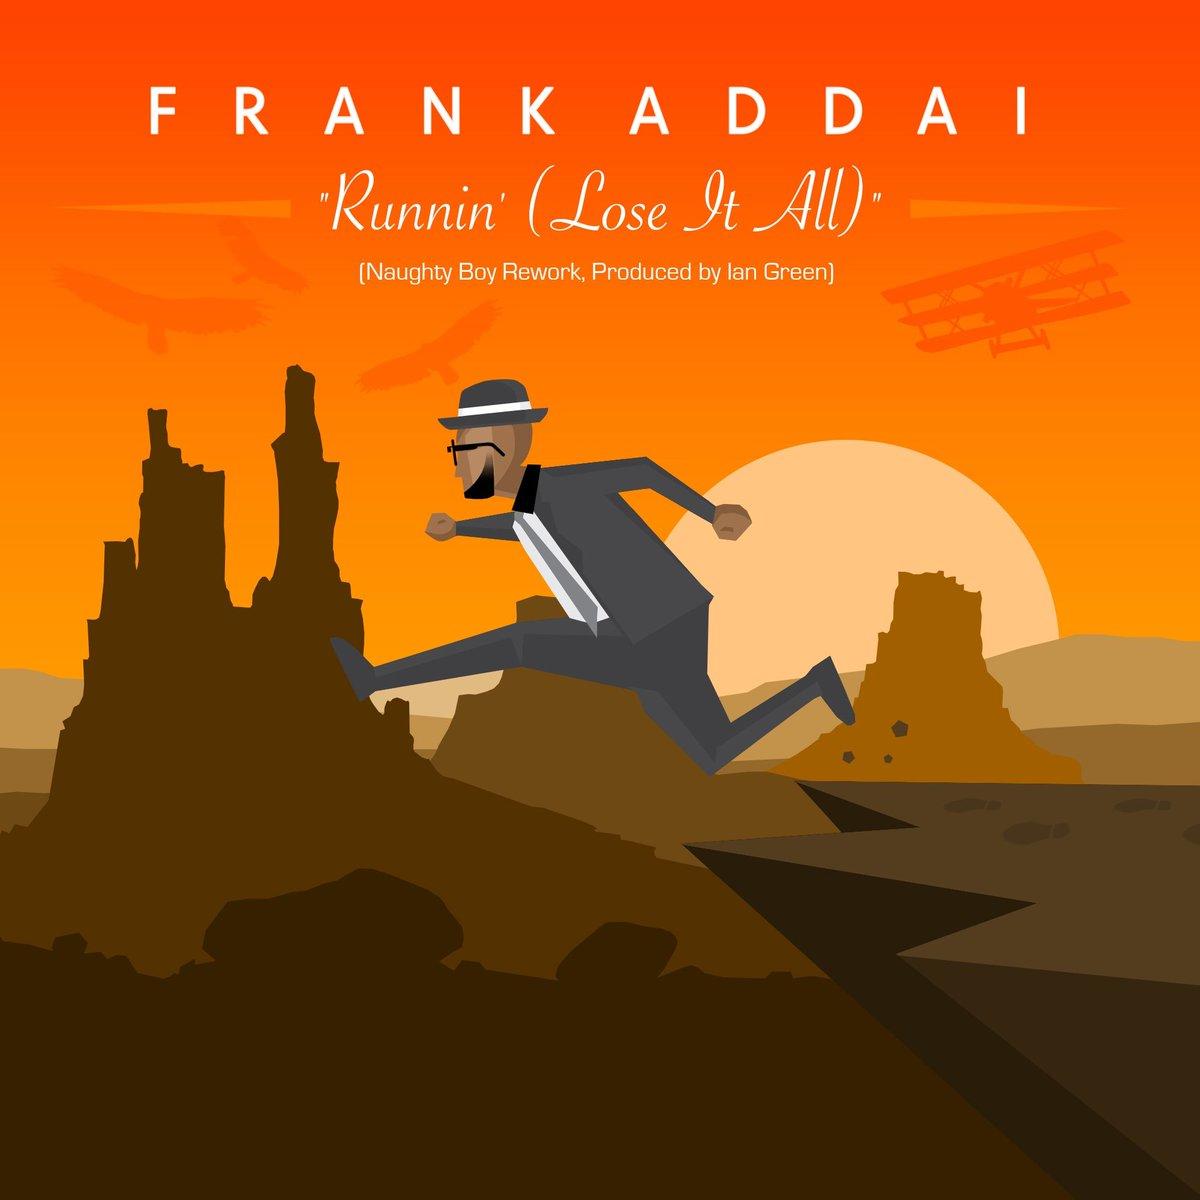 #NEWTrackAlert!!! @frankaddaisoul - 'Runnin' (Lose It All)'.&#39; A glorious R&amp;B of @NaughtyBoyMusic hit.&#39;- @mandy_nanaa  http:// buff.ly/2mPlDDA  &nbsp;  <br>http://pic.twitter.com/UvtawNpstU